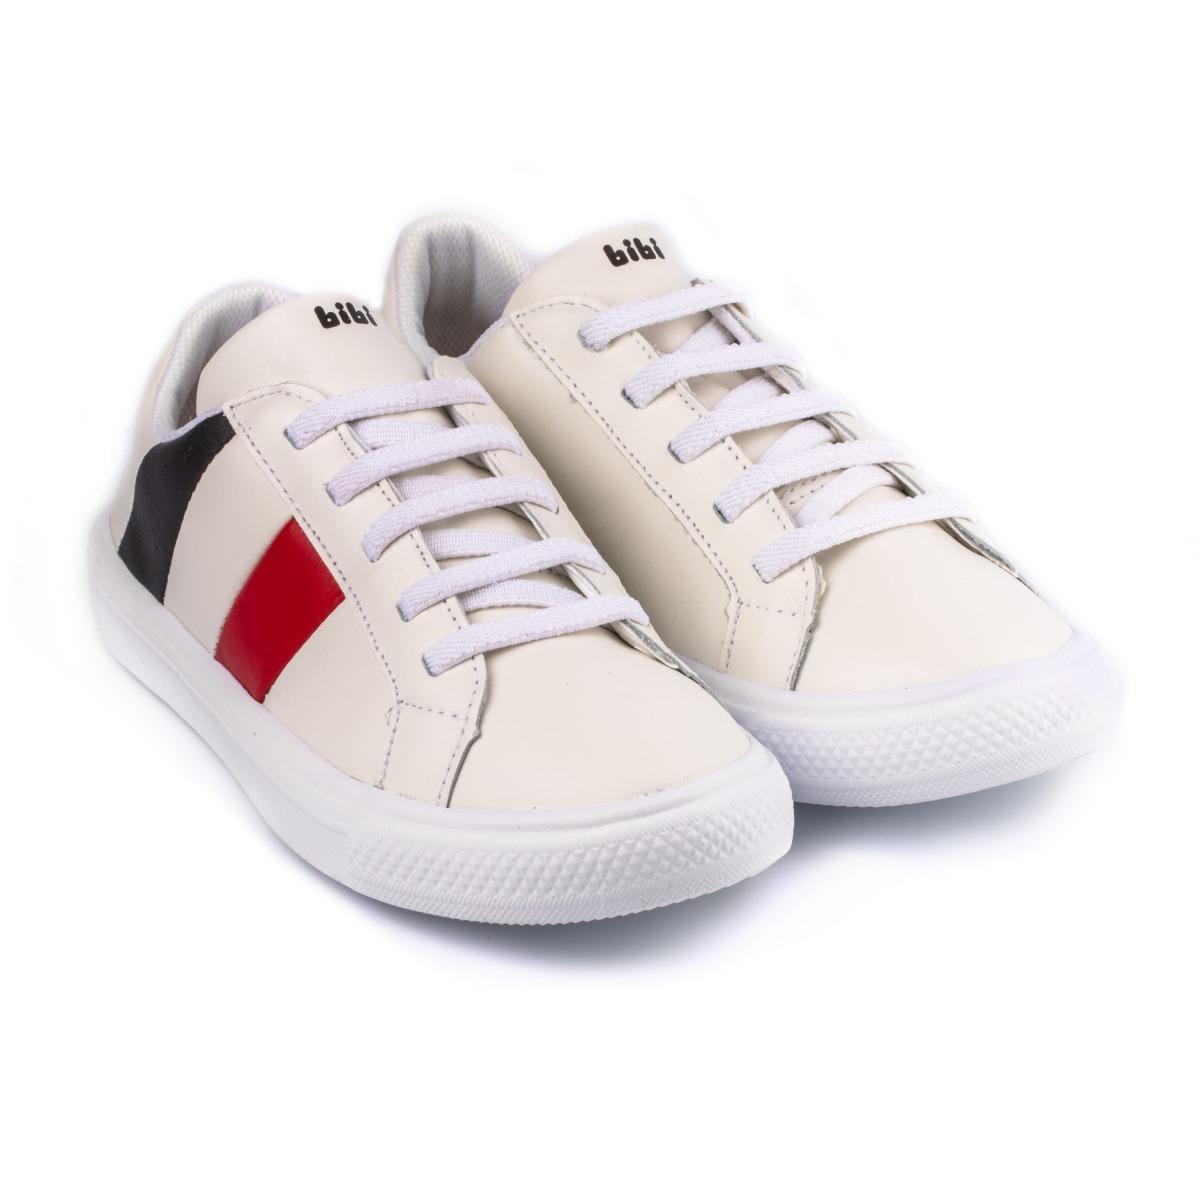 Pantofi Bibi Agility III Color, Alb